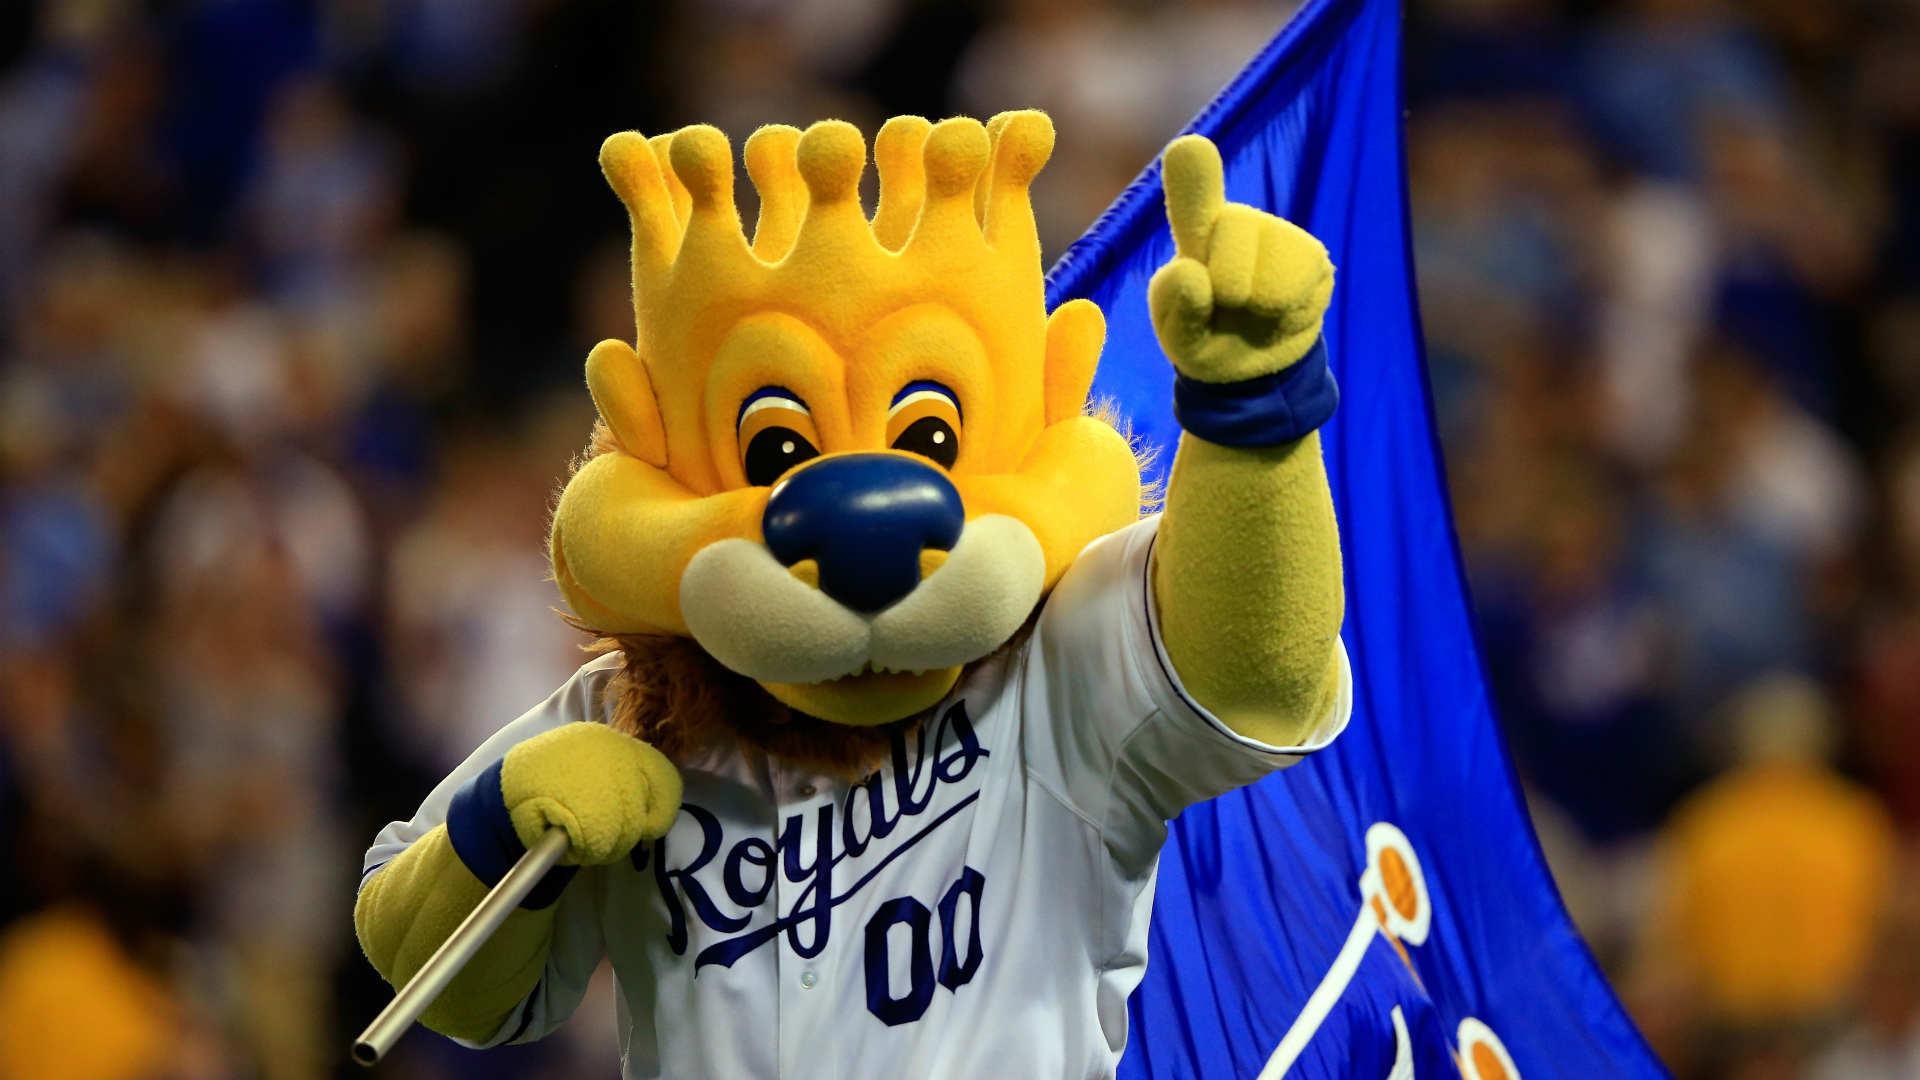 Royals-Mascot-061715-USNews-Getty-FTR